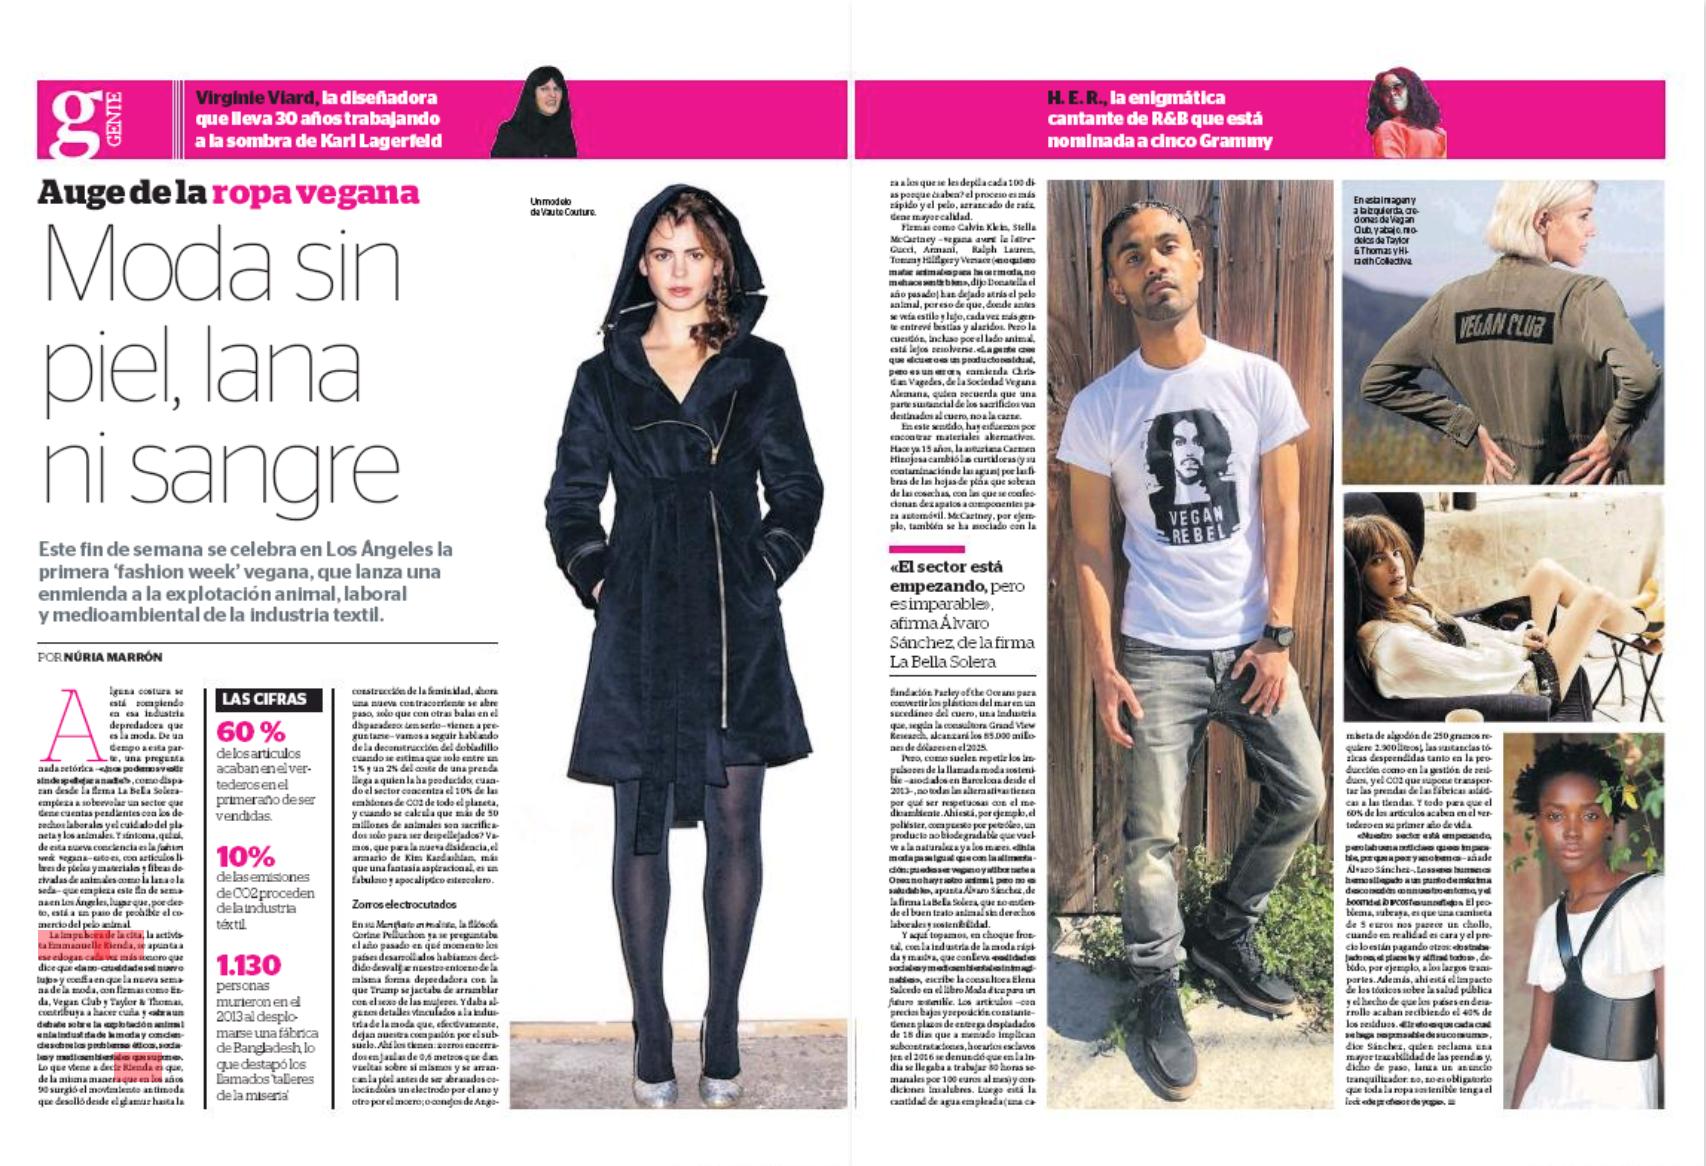 El Periódico Spain - February 2019